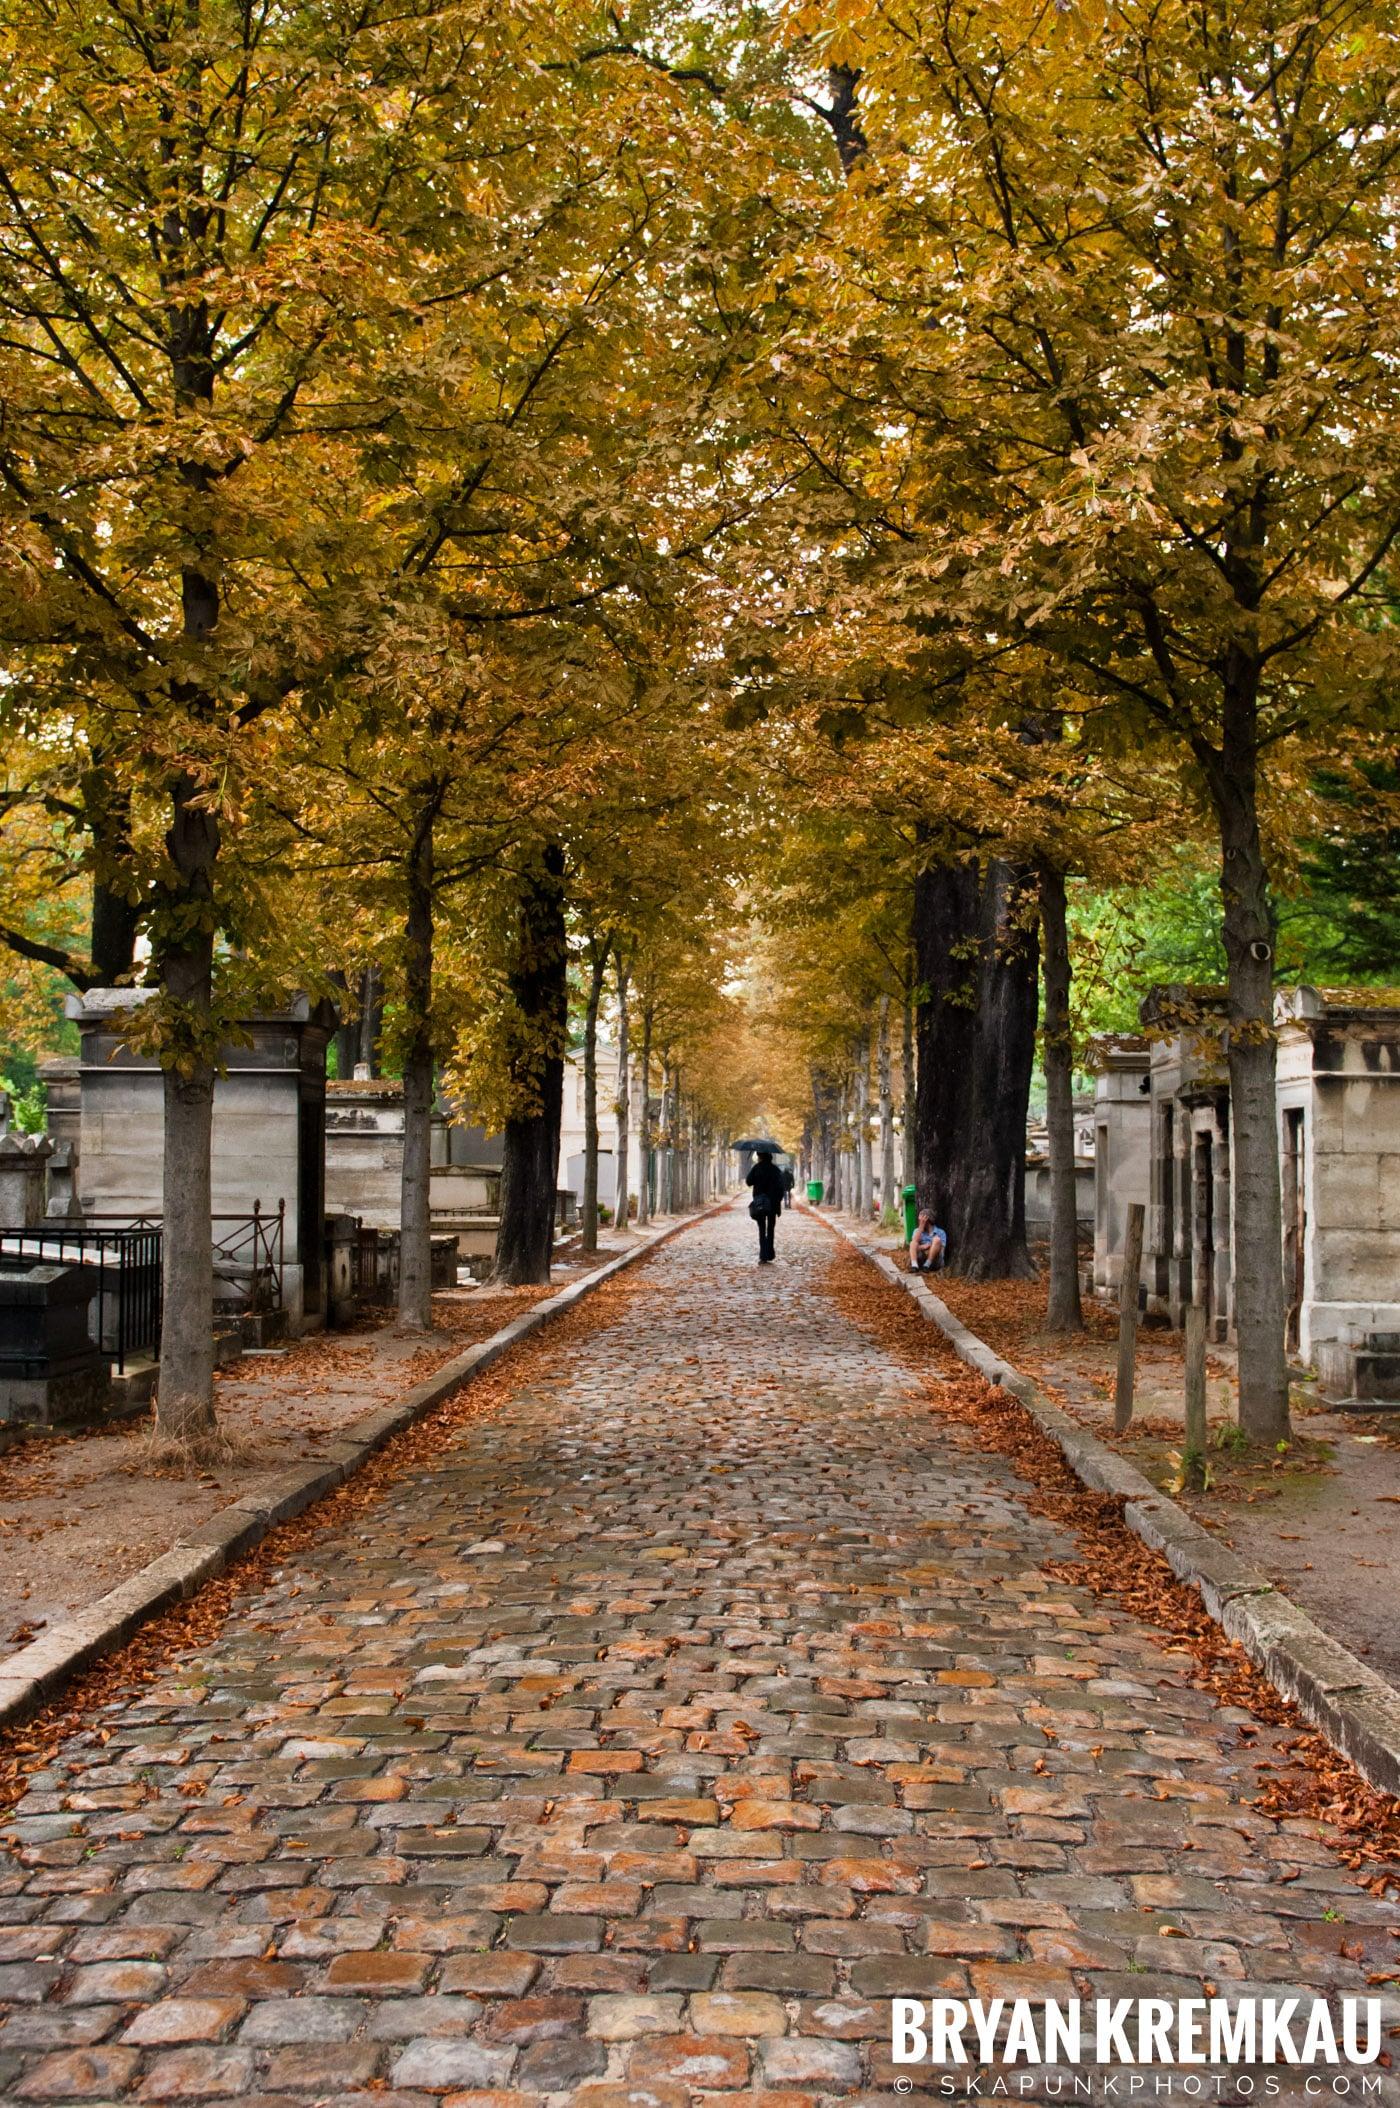 Paris, France Honeymoon - Day 5 - 7.22.11 (24)